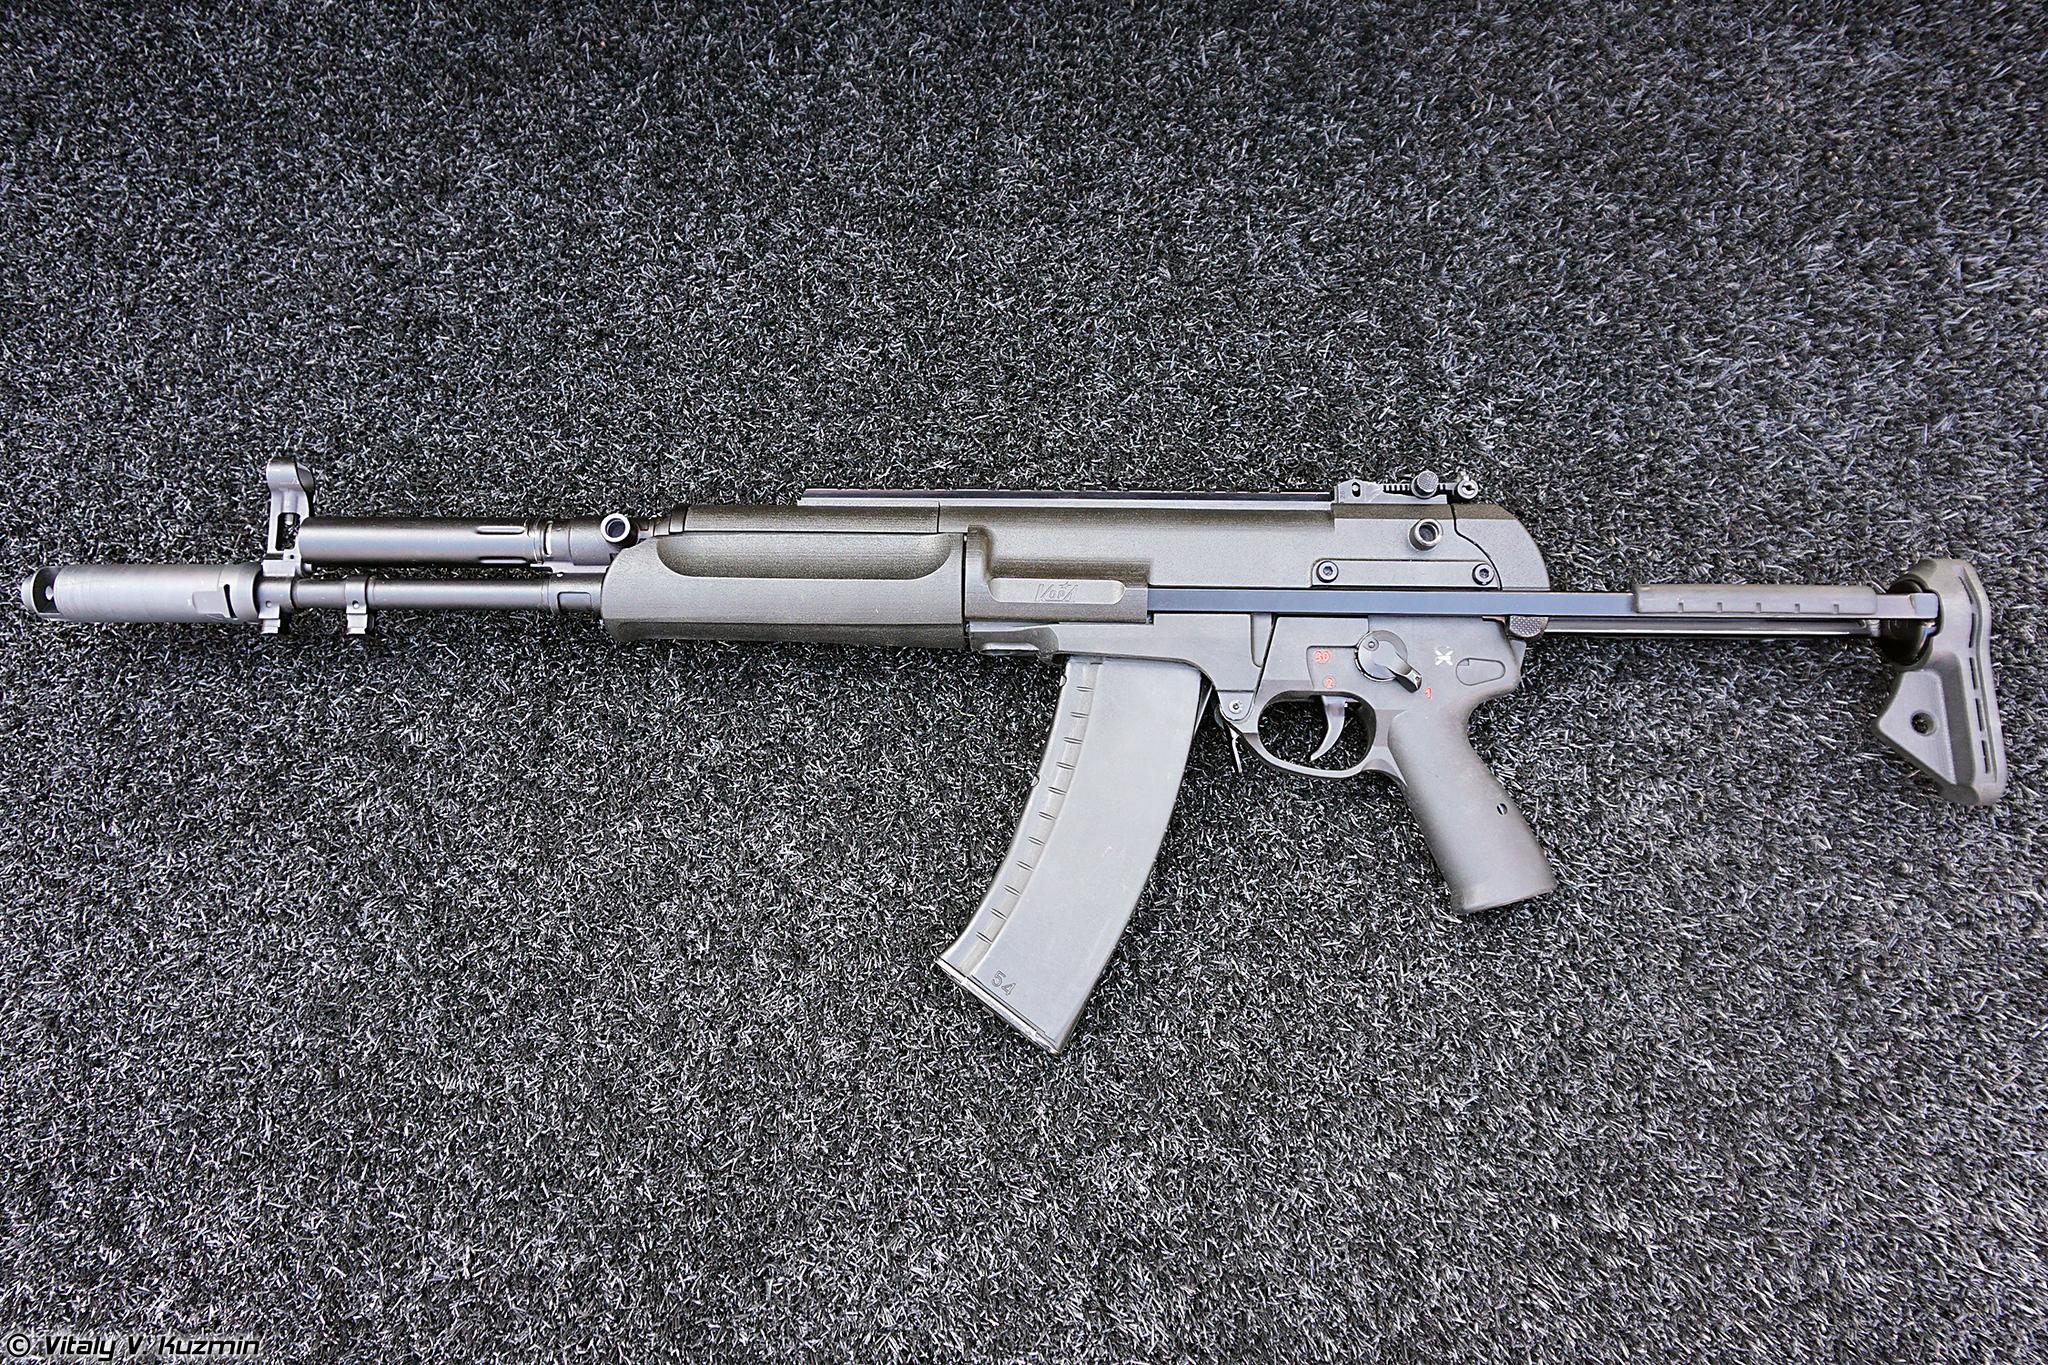 Russian Assault Rifles/Carbines/Machine Guns Thread: #2 - Page 10 Army-2020-Pavilions-024-X4